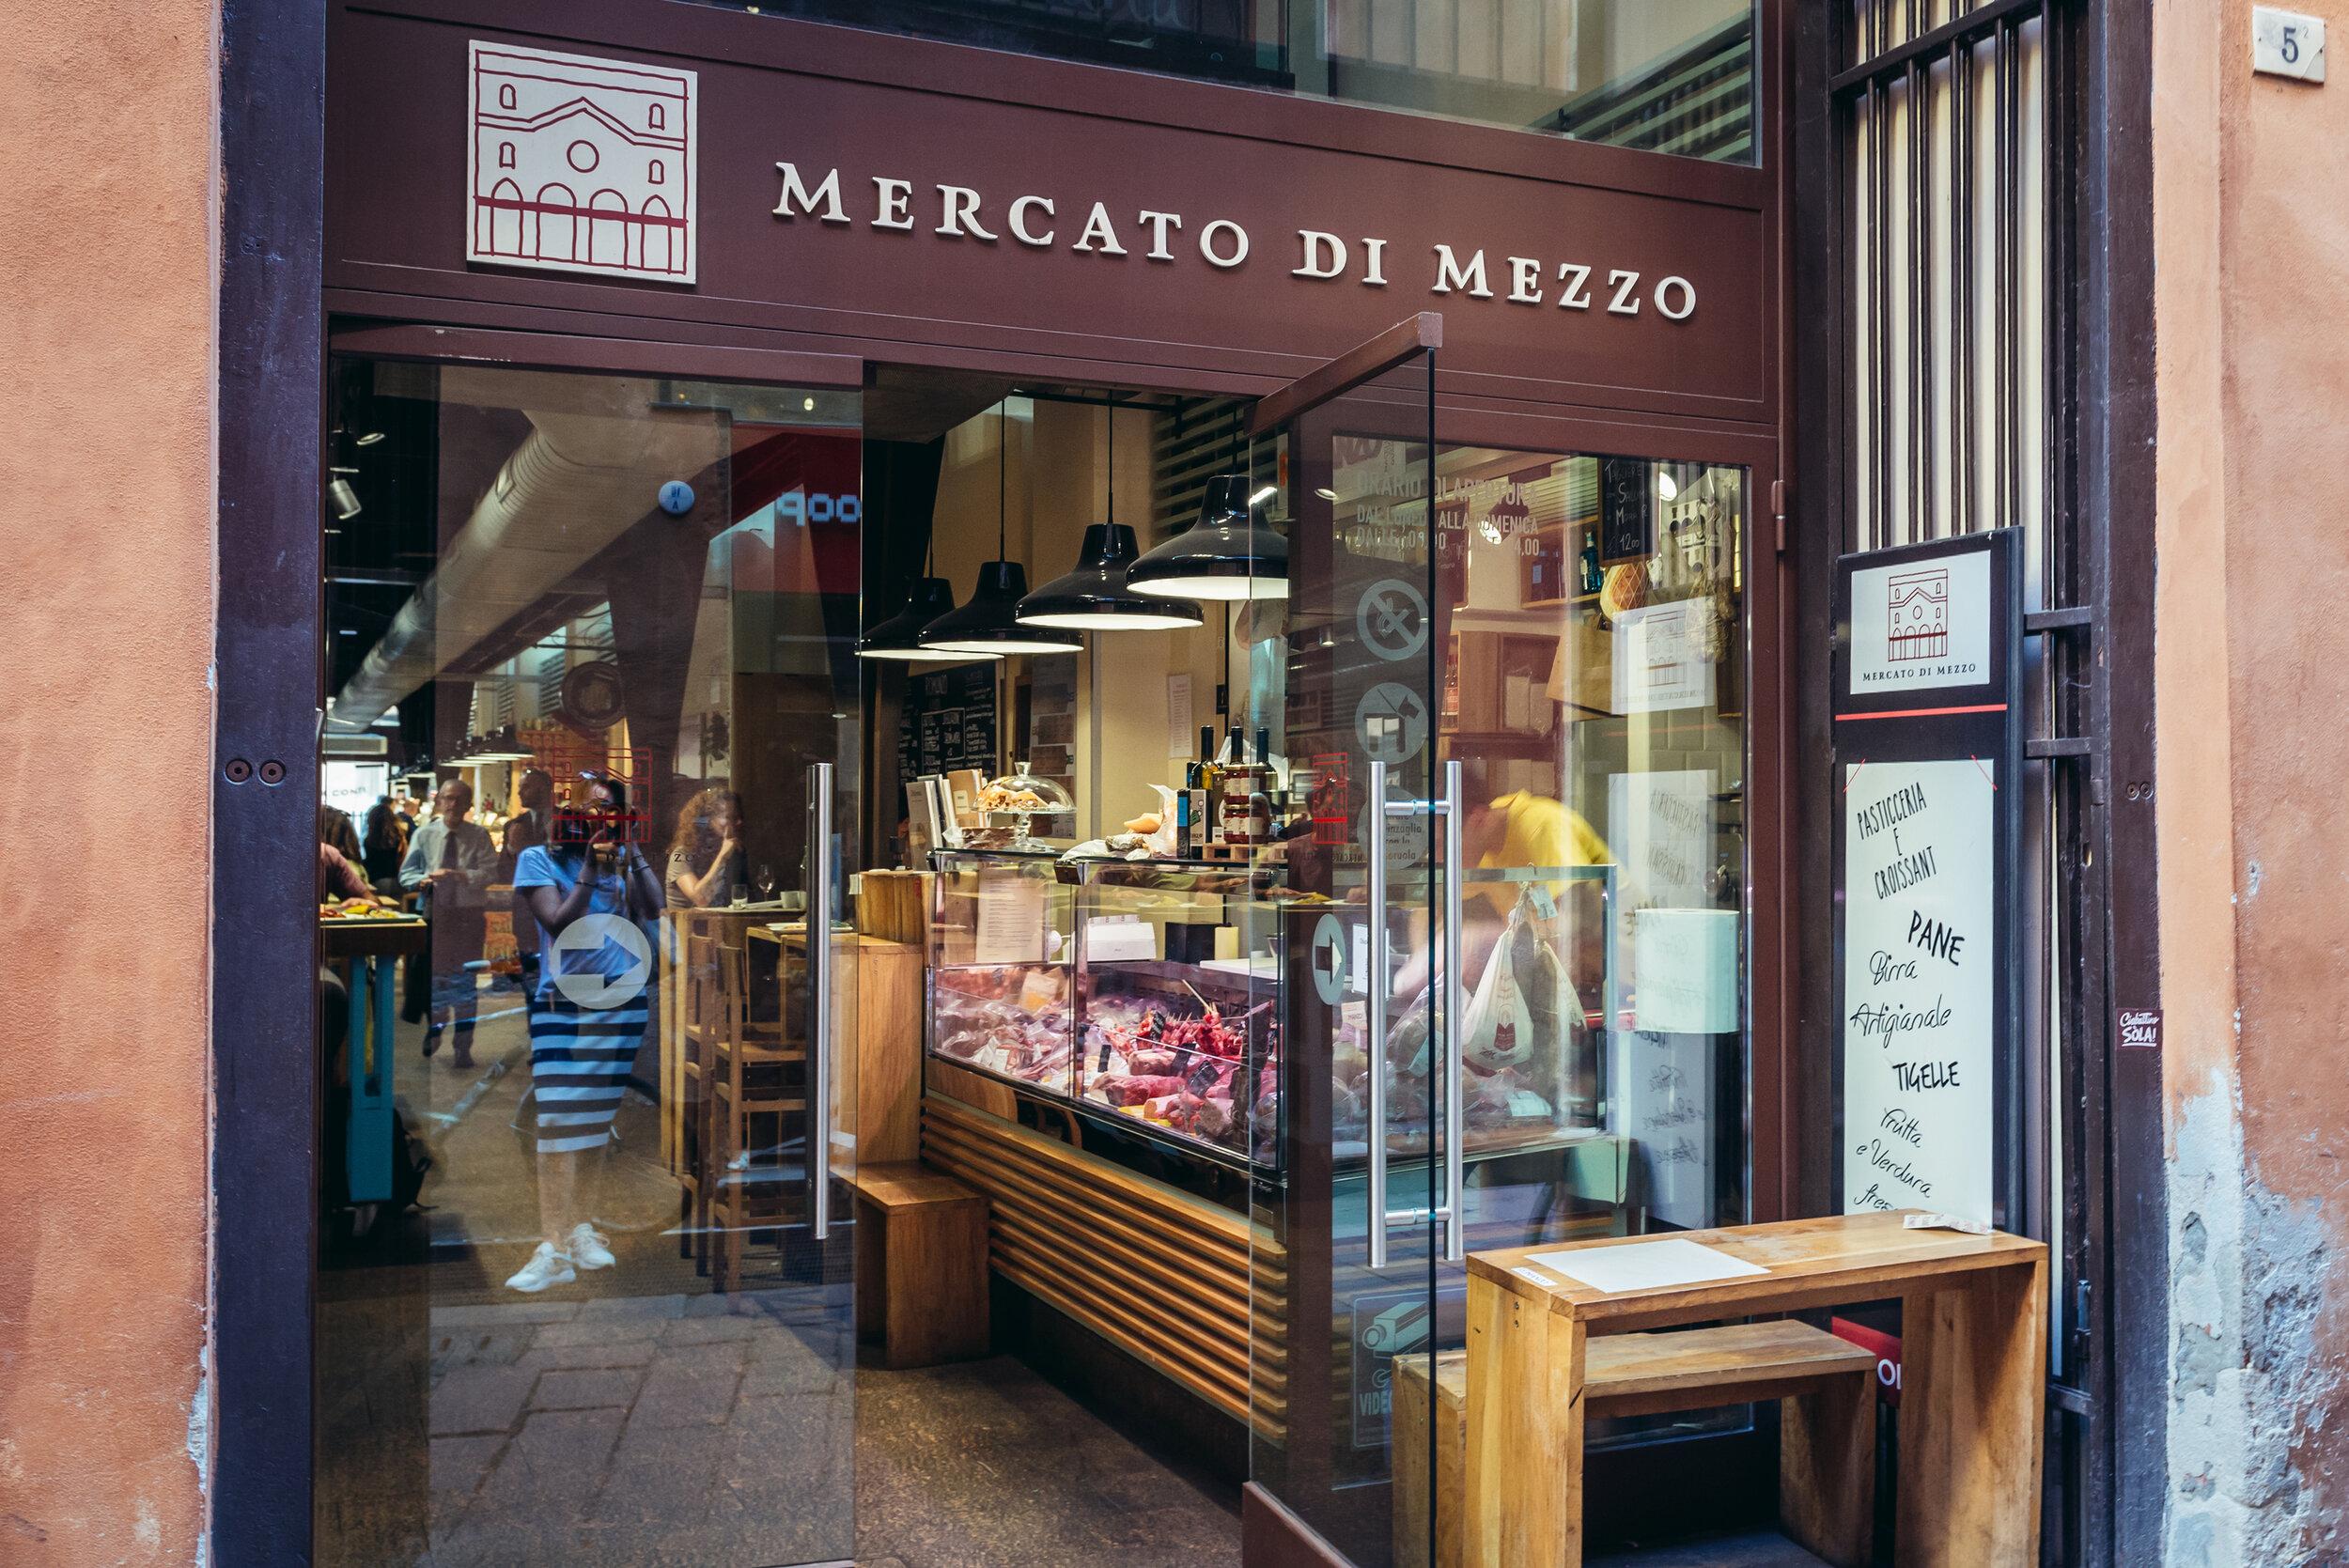 Visit Bologna food market, Mercato Di Mezzo, for regional Emilia-Romagna foods.